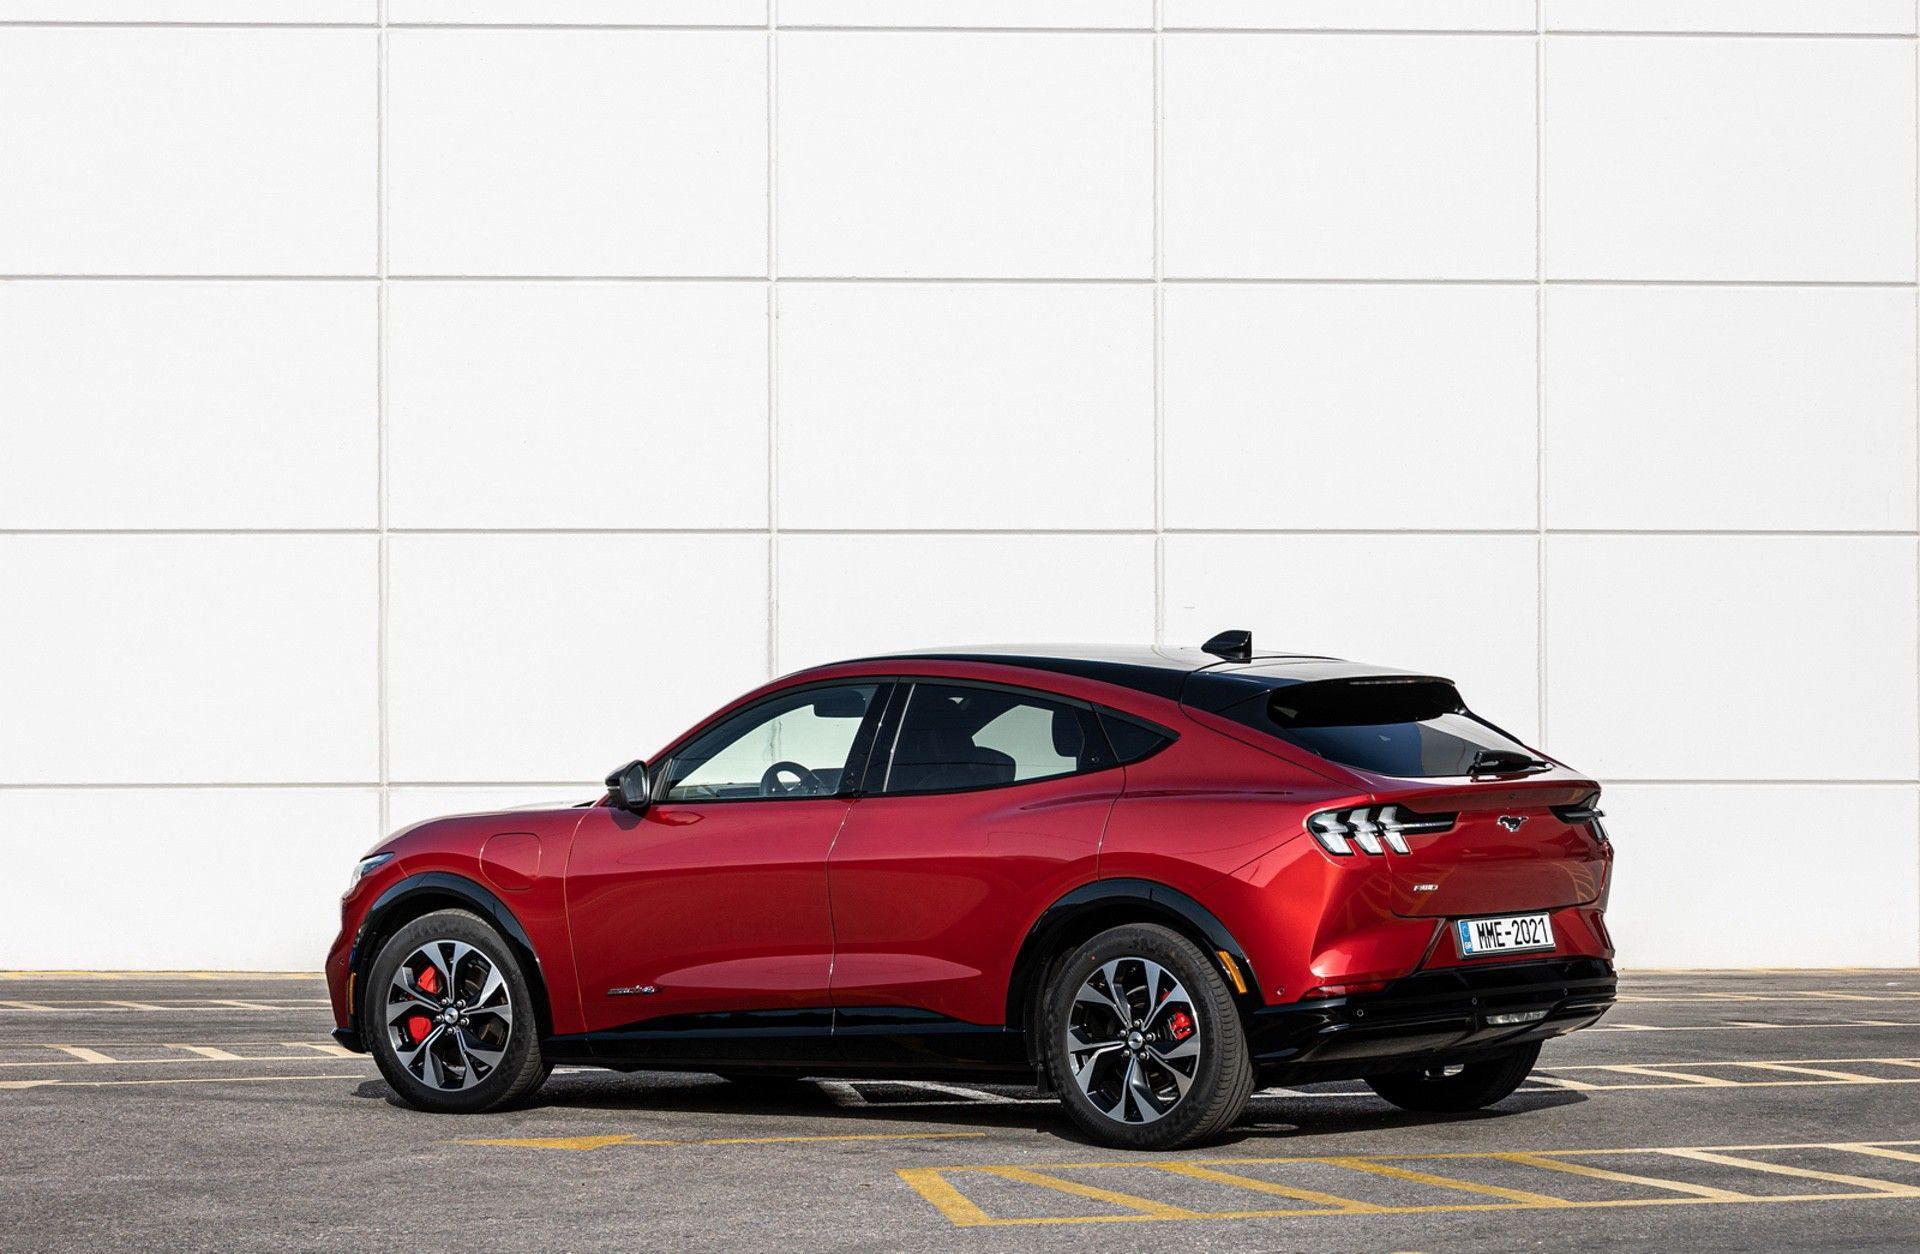 Ford_Mustang_Mach-E_greek_presskit-0056